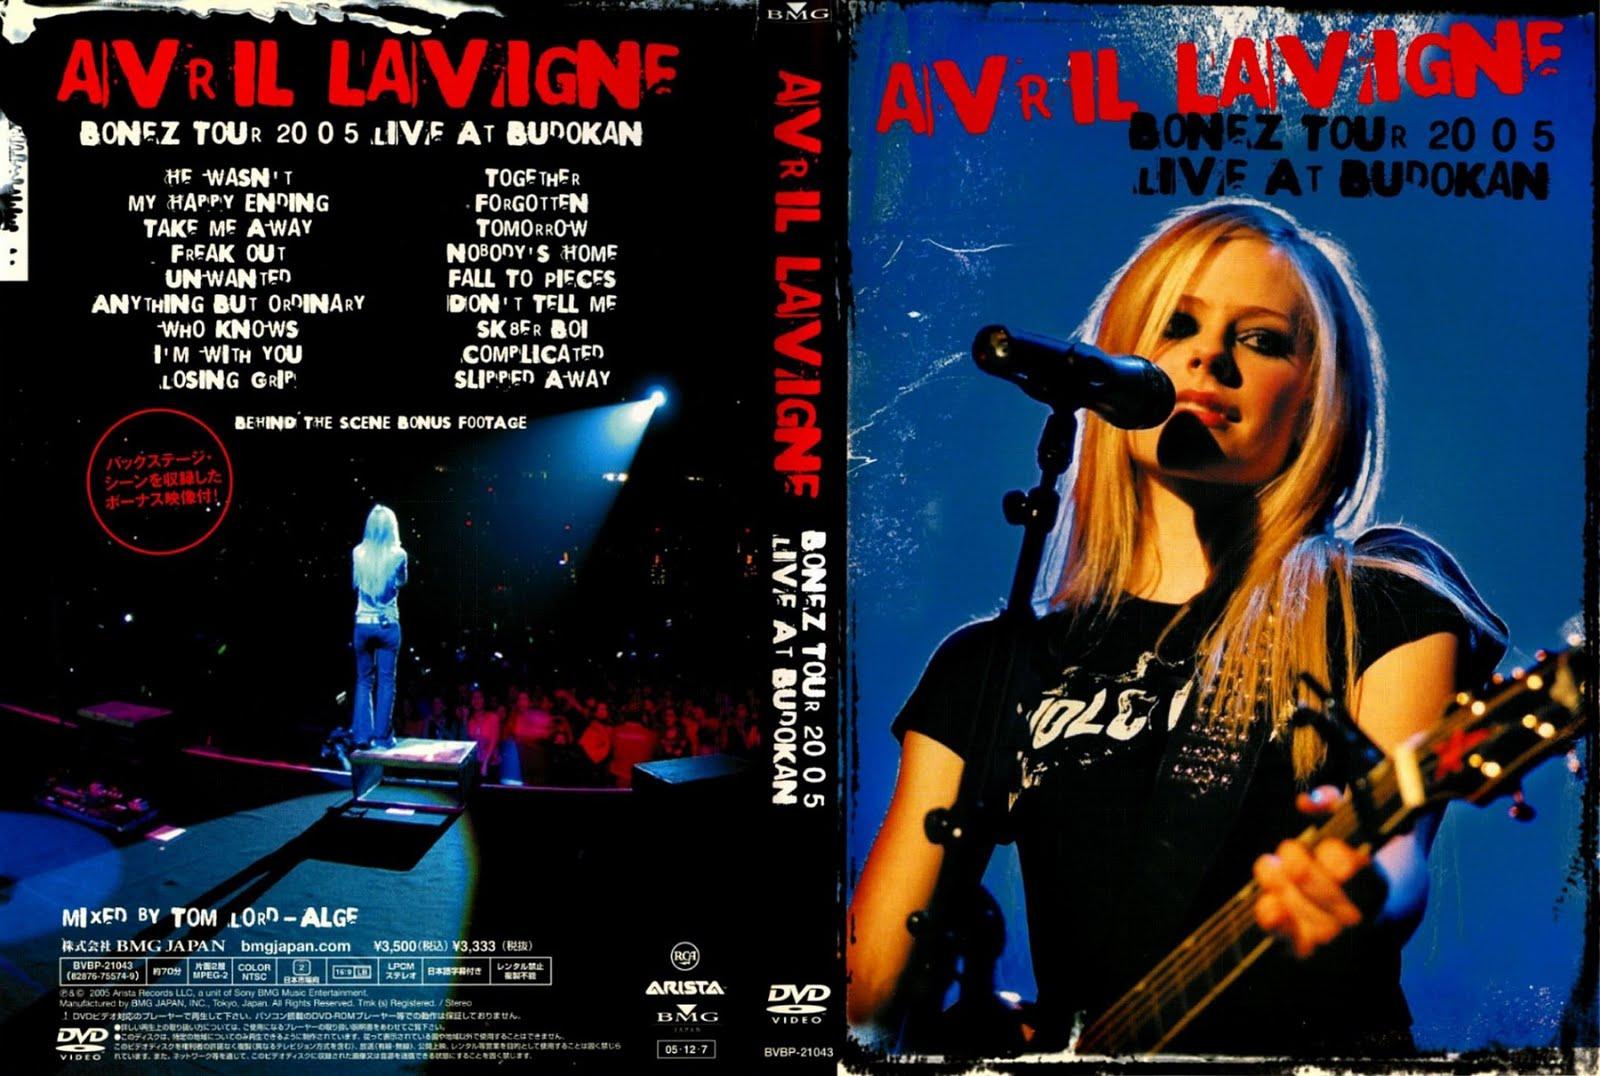 http://3.bp.blogspot.com/_d2izdxAUXNA/TCtQNypeZkI/AAAAAAAAAeU/_bK2bfKIFxQ/s1600/Avril_Lavigne-Bonez_Tour_2005_Live_At_Budokan_%28Dvd%29-Caratula.jpg